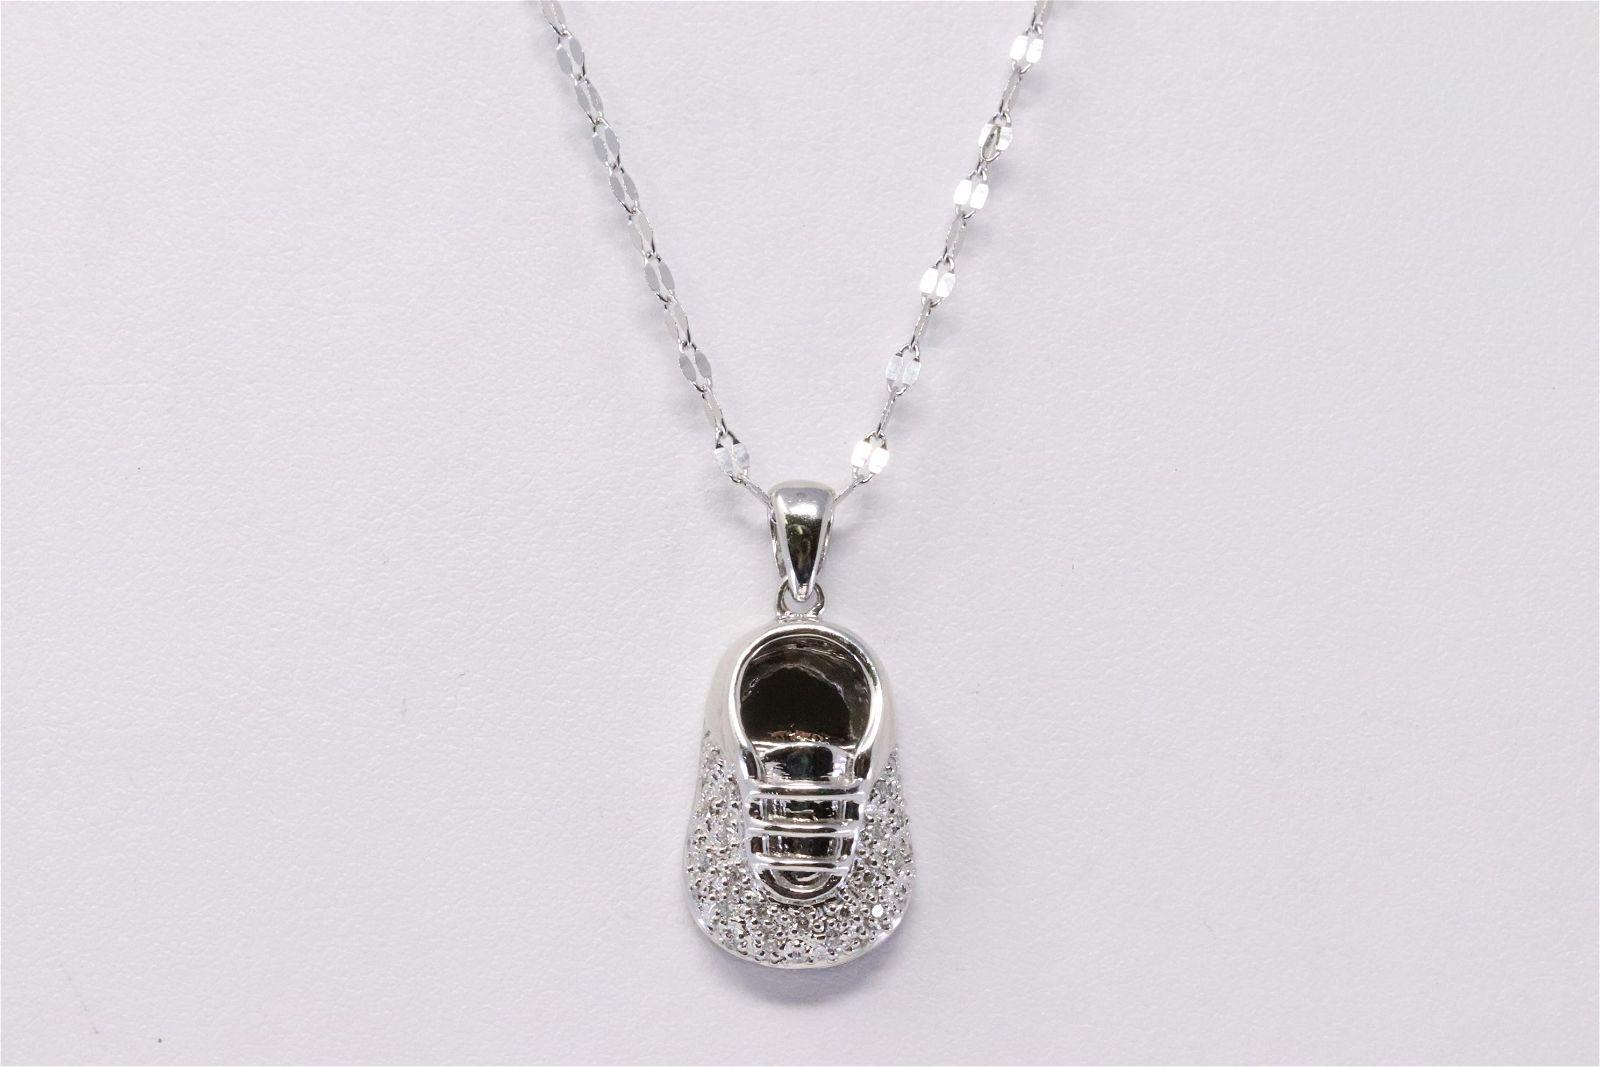 14kt White Gold Diamond Shoe Pendant & Necklace.